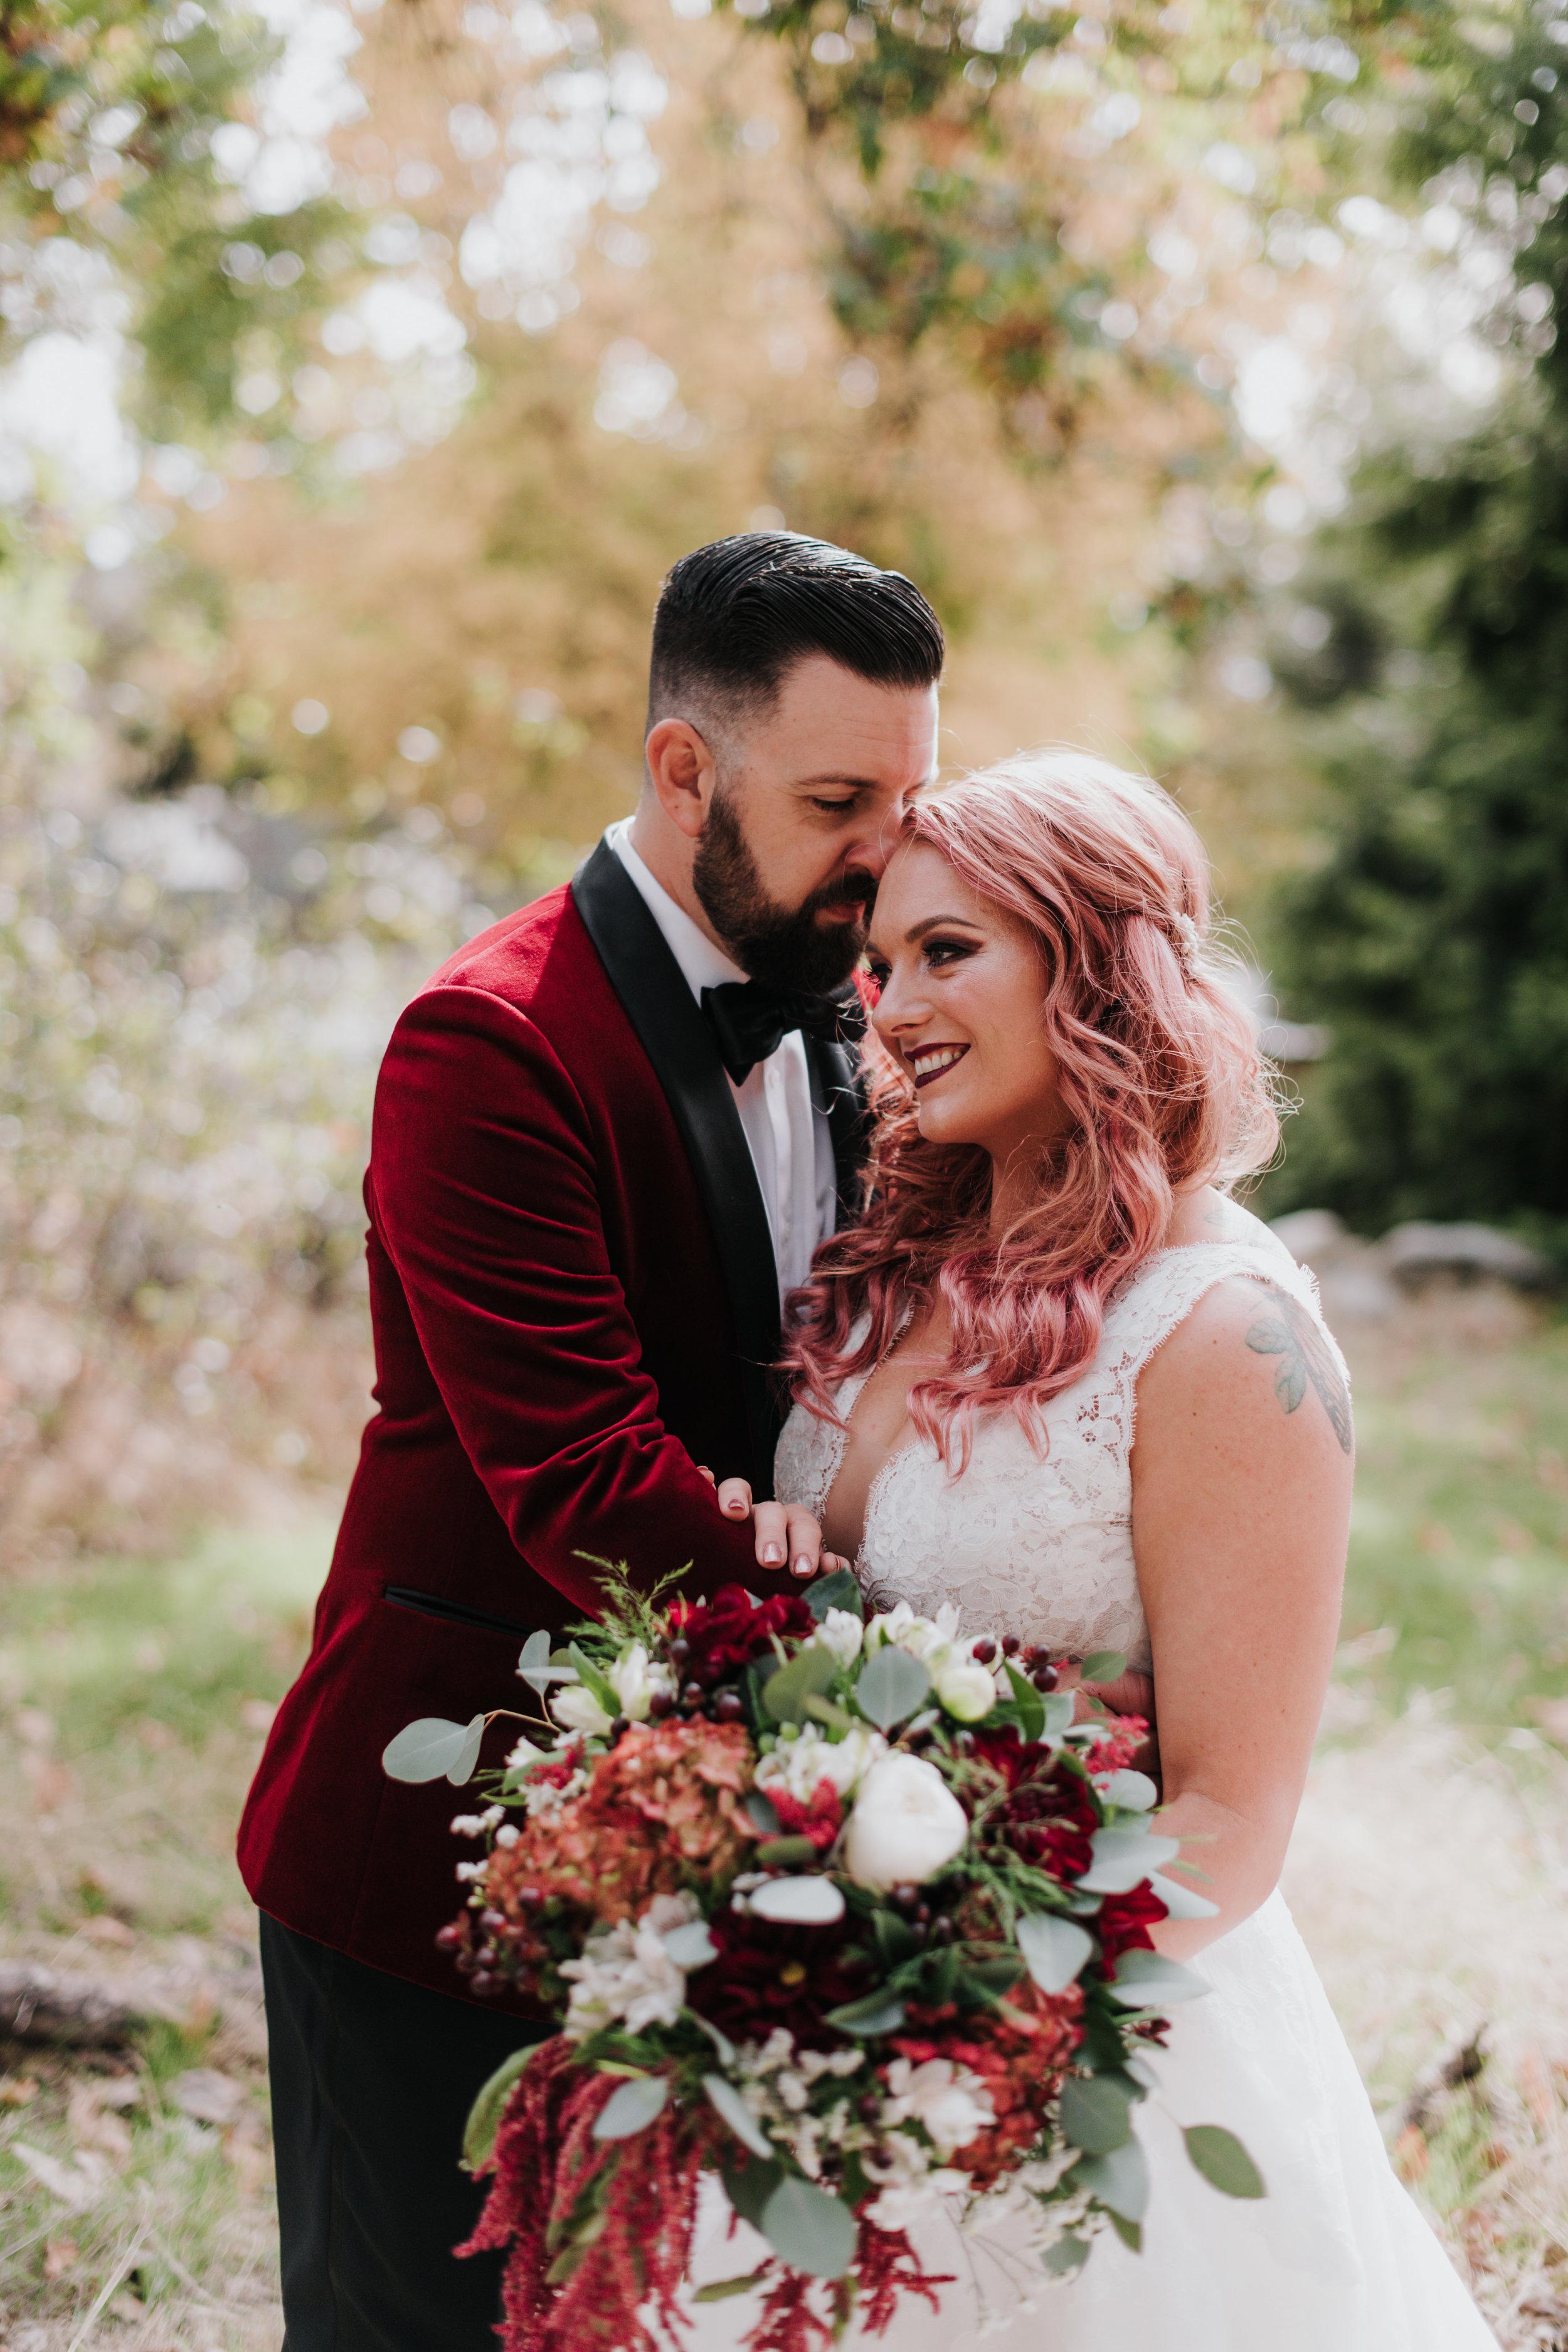 2018-11-04 Maresa and Nick - Married - Oak Glen-399.jpg